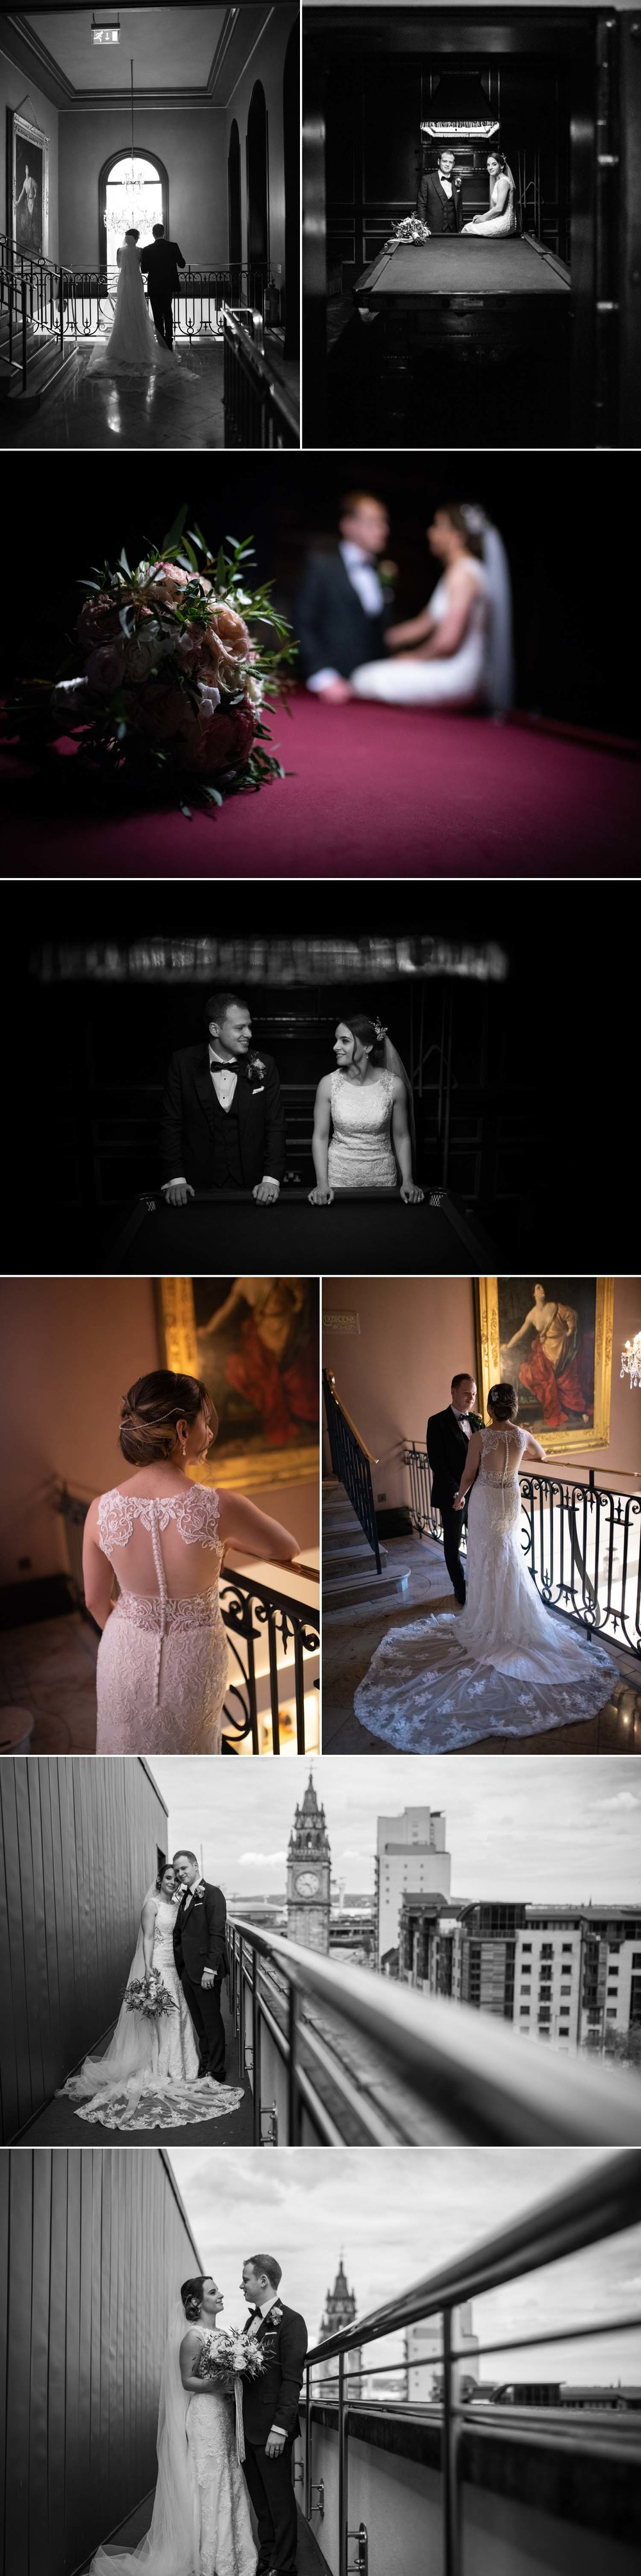 Merchant Hotel Belfast Wedding Photography James McGrillis 17.jpg